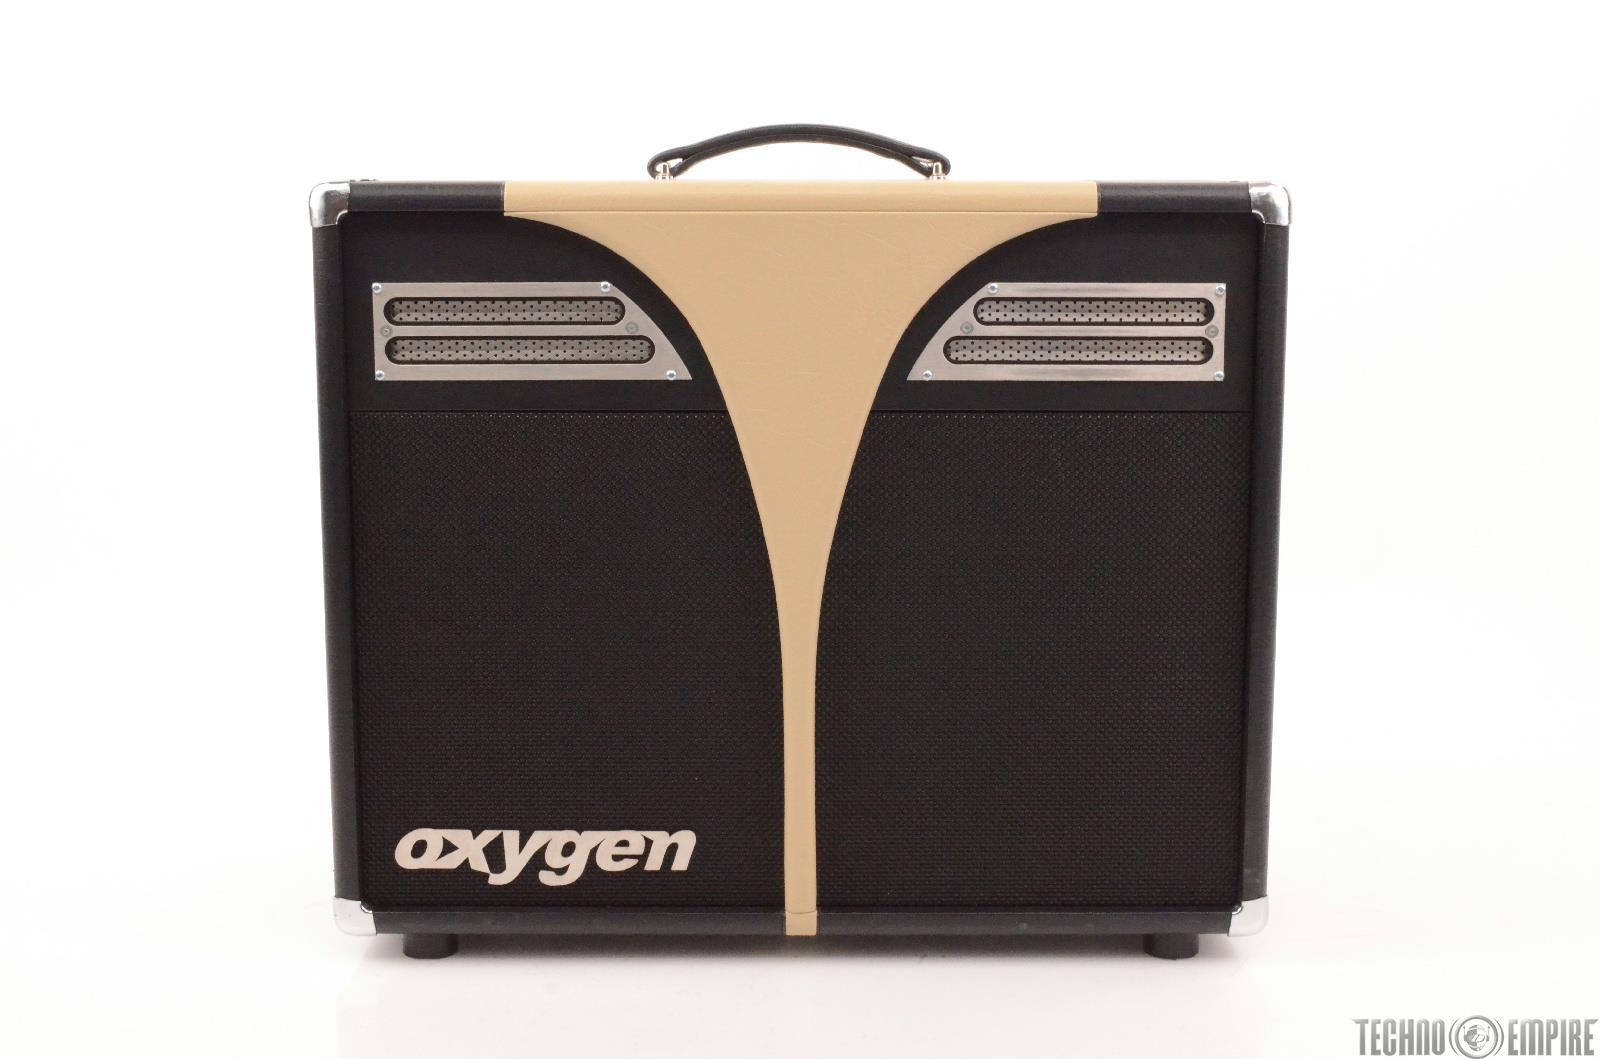 OXYGEN Ozone 18 Watt 1x12 Tube Amp Combo Guitar Amplifier #26747